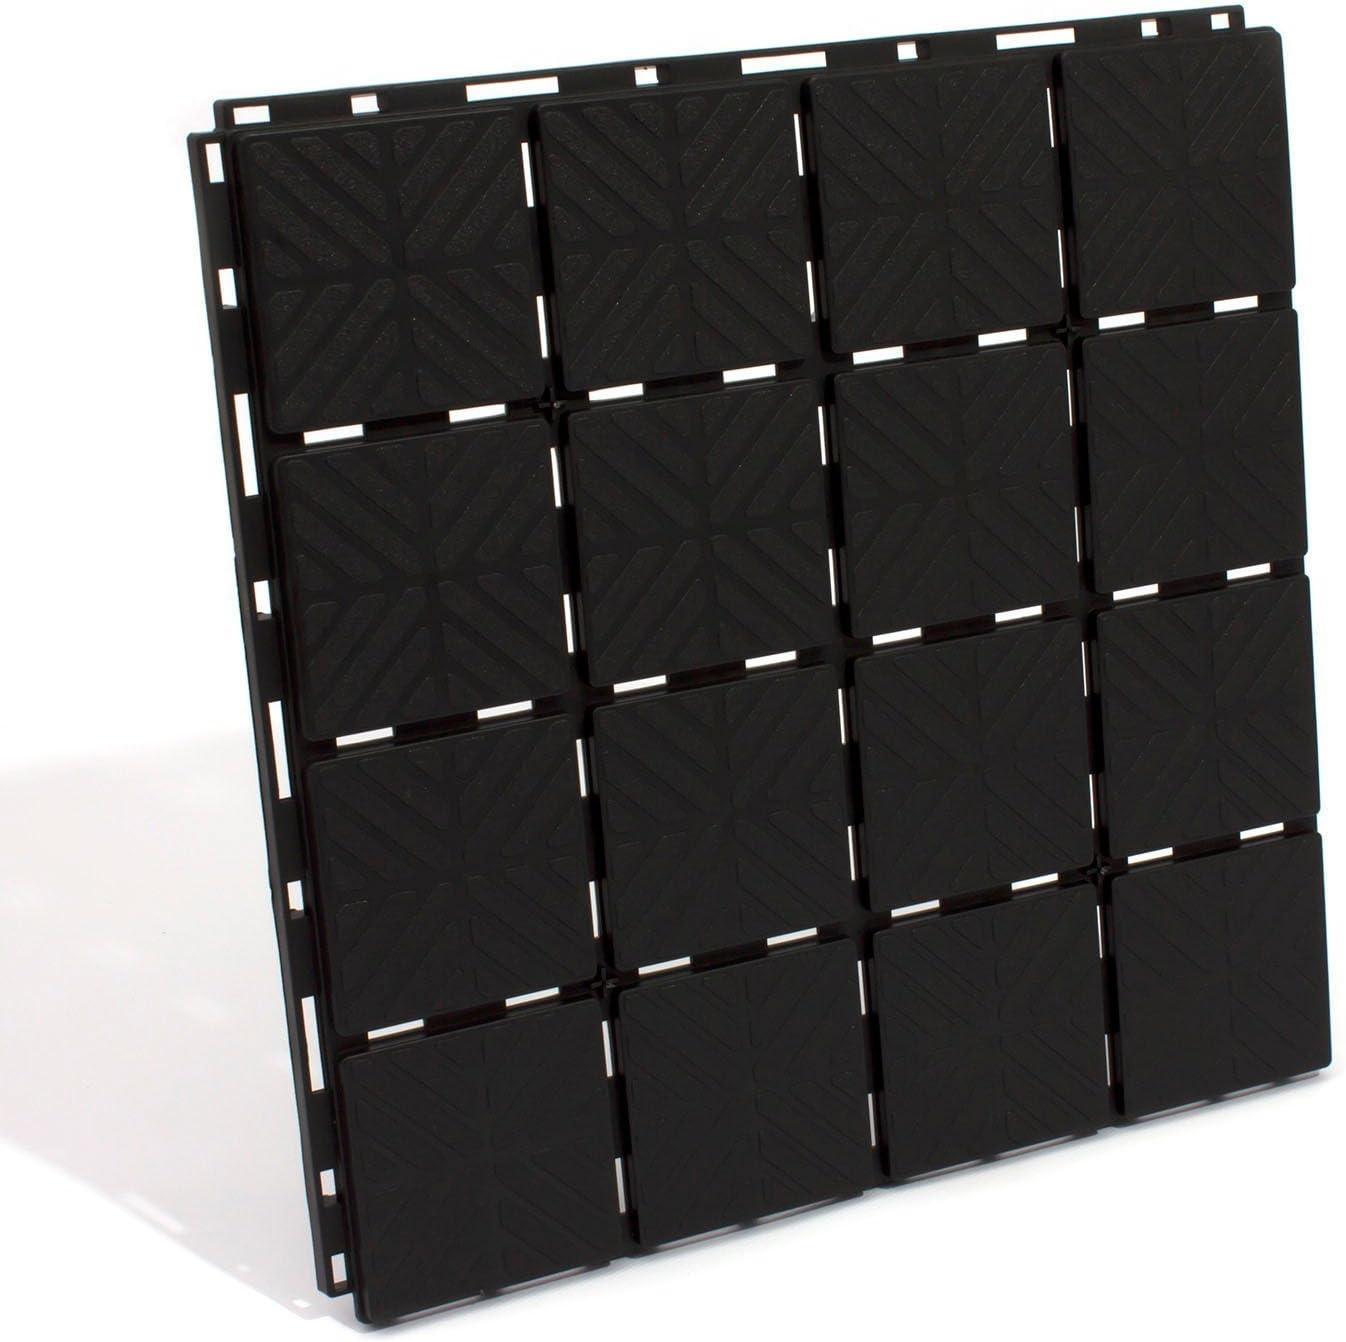 Zanvic Pack de 9 baldosas plástico de 40 x 40 x 2 cm, Negro, ZA527